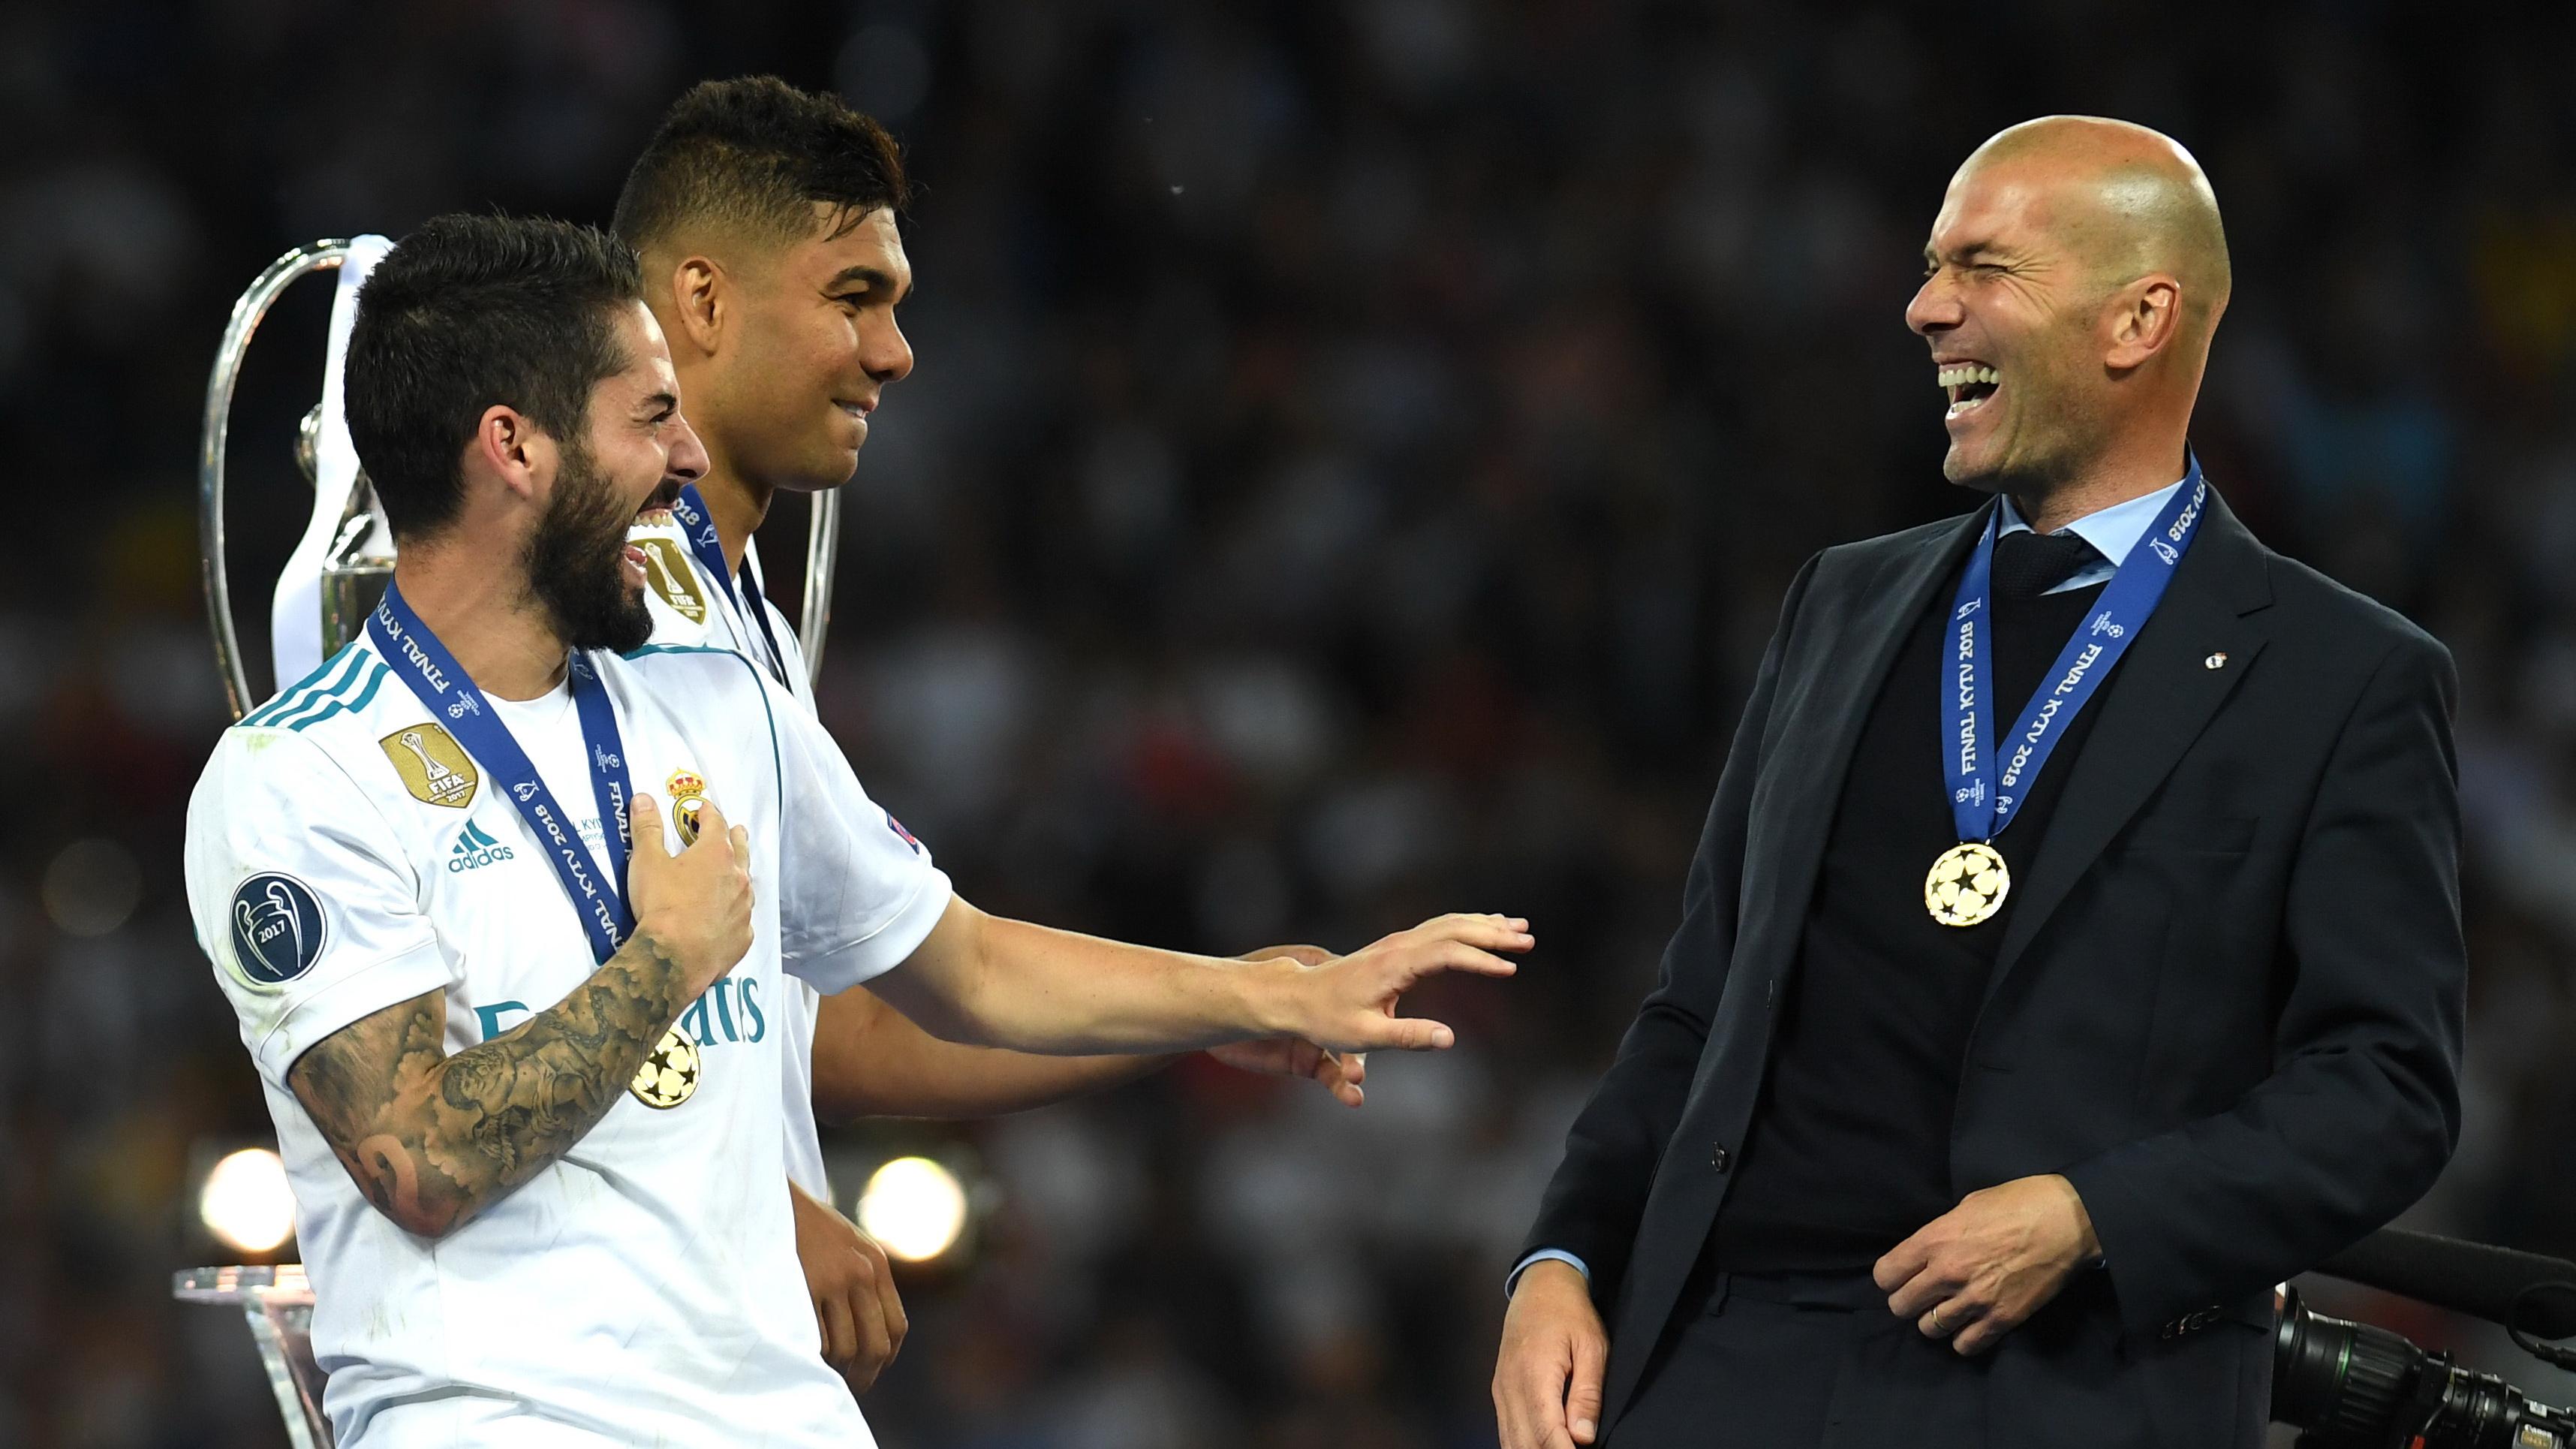 Isco Alarcon Zinedine Zidane Real Madrid Livepool Champions League 2018